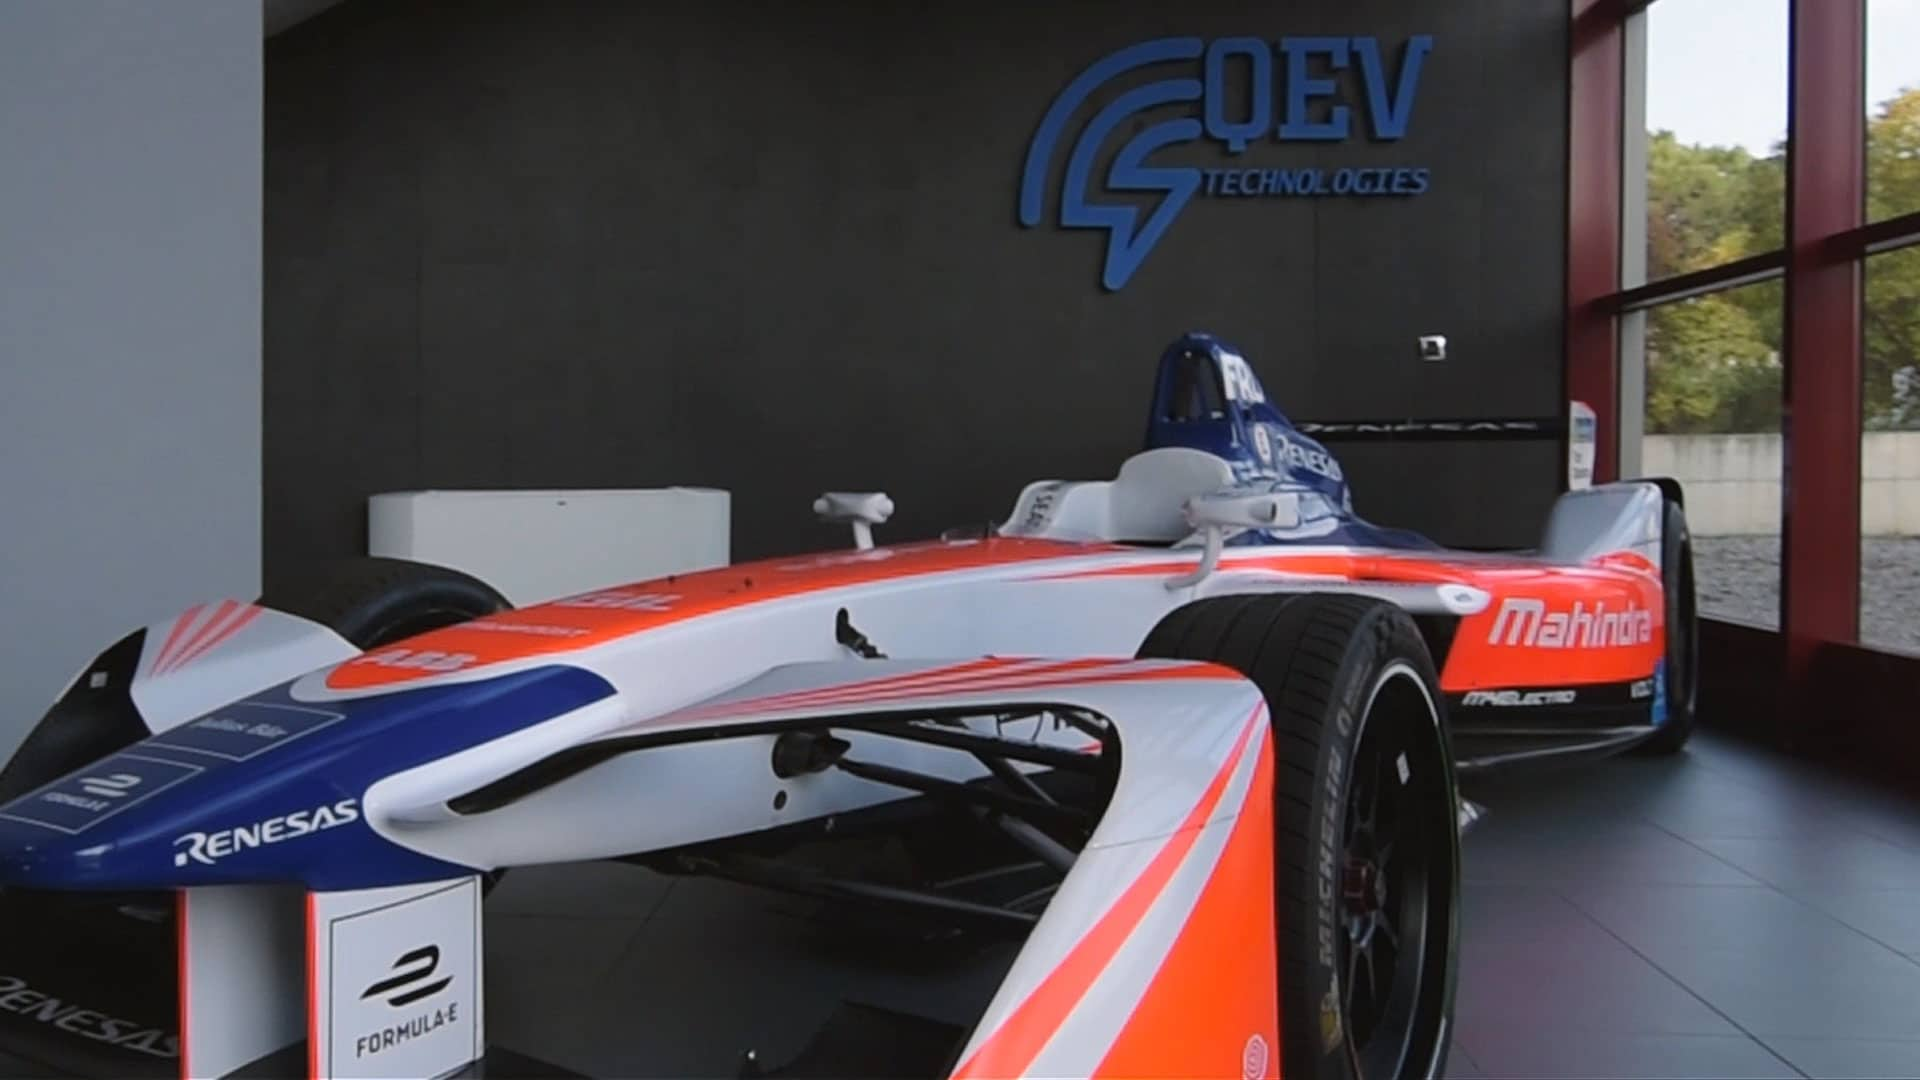 QEV Technologies formación, cursos